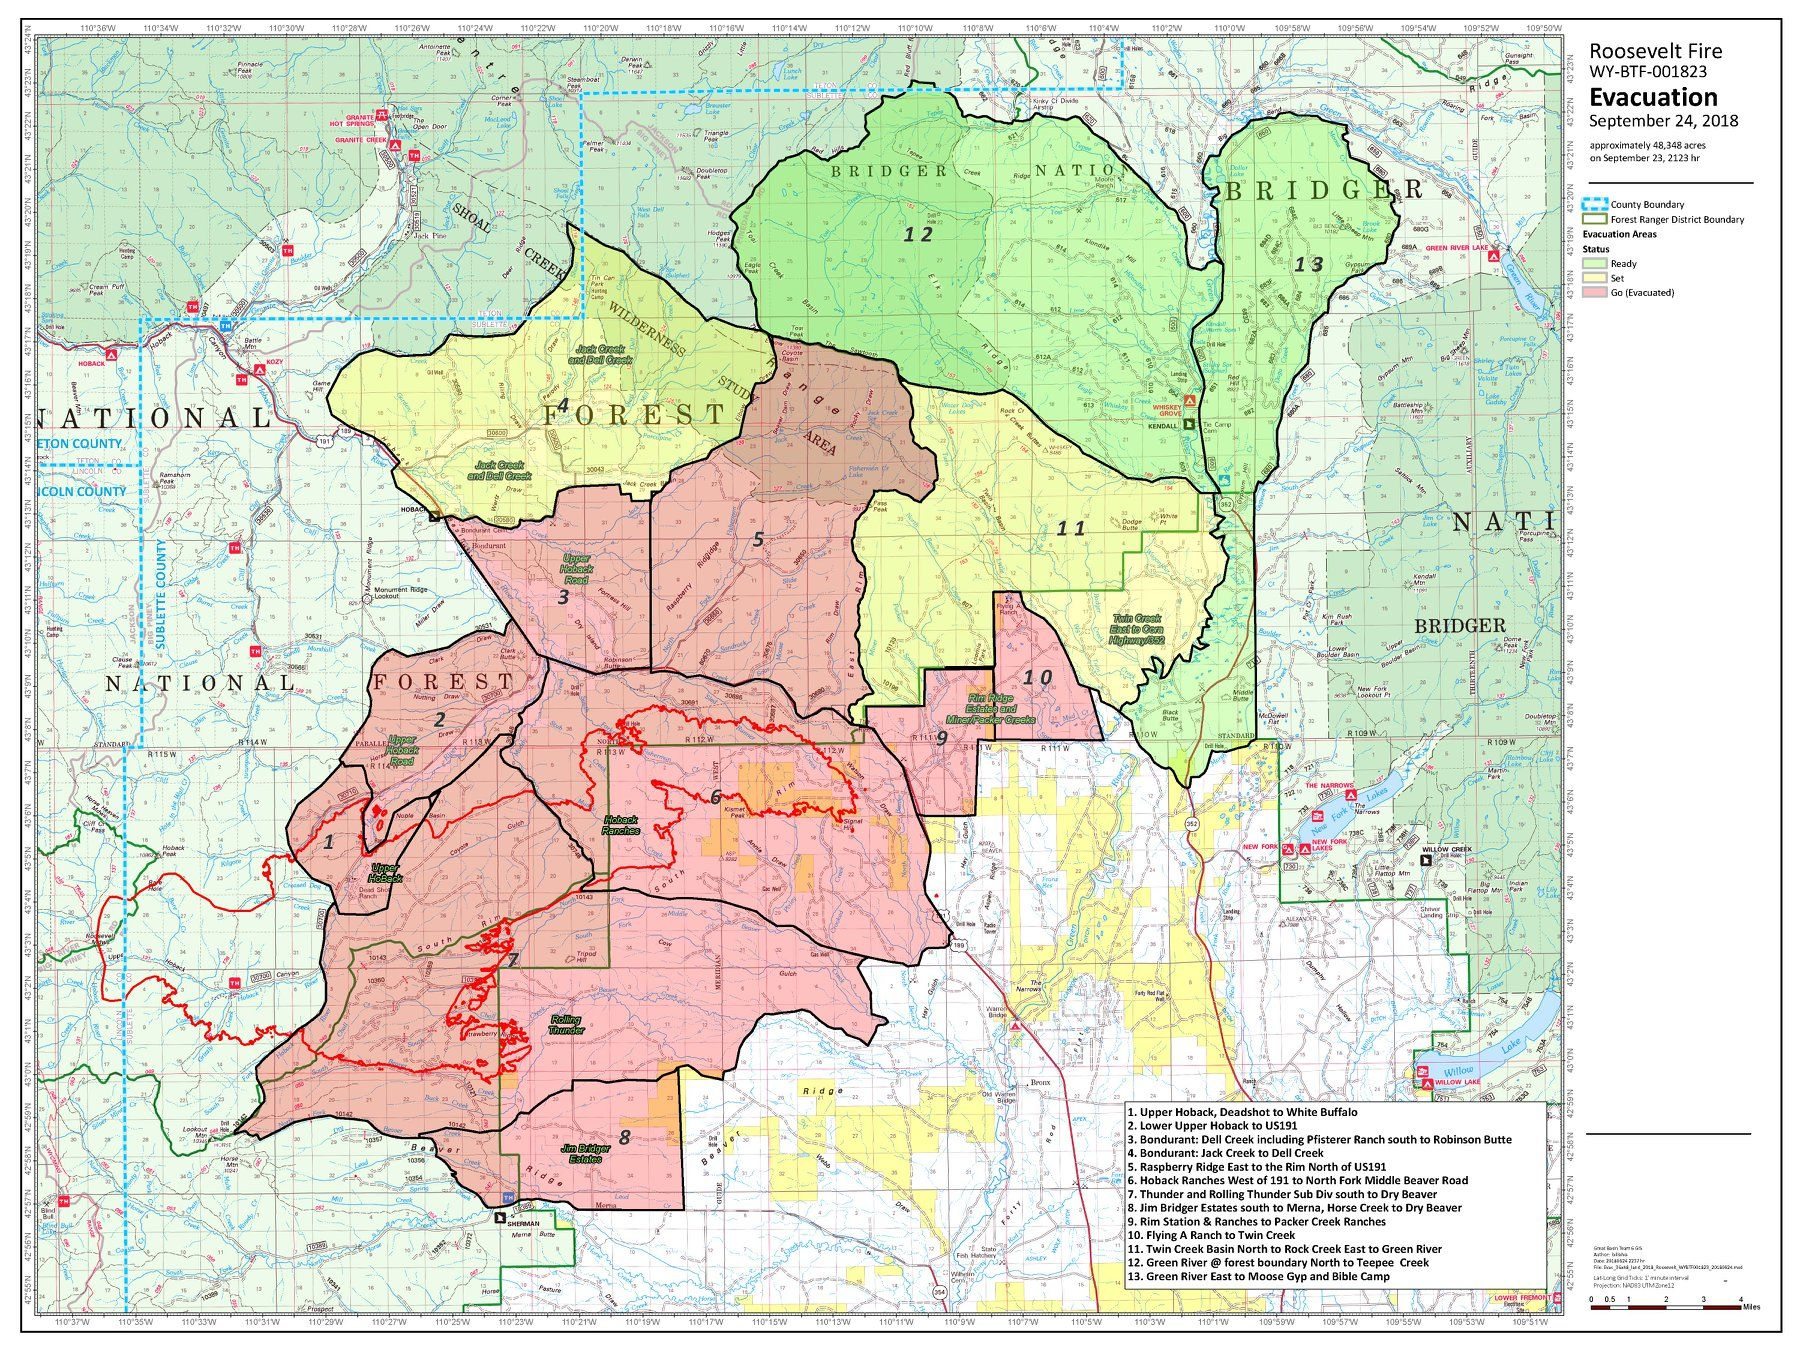 Bondurant Wyoming Map.Roosevelt Fire Map Update Wyoming Wildfire Burns 49 805 Acres